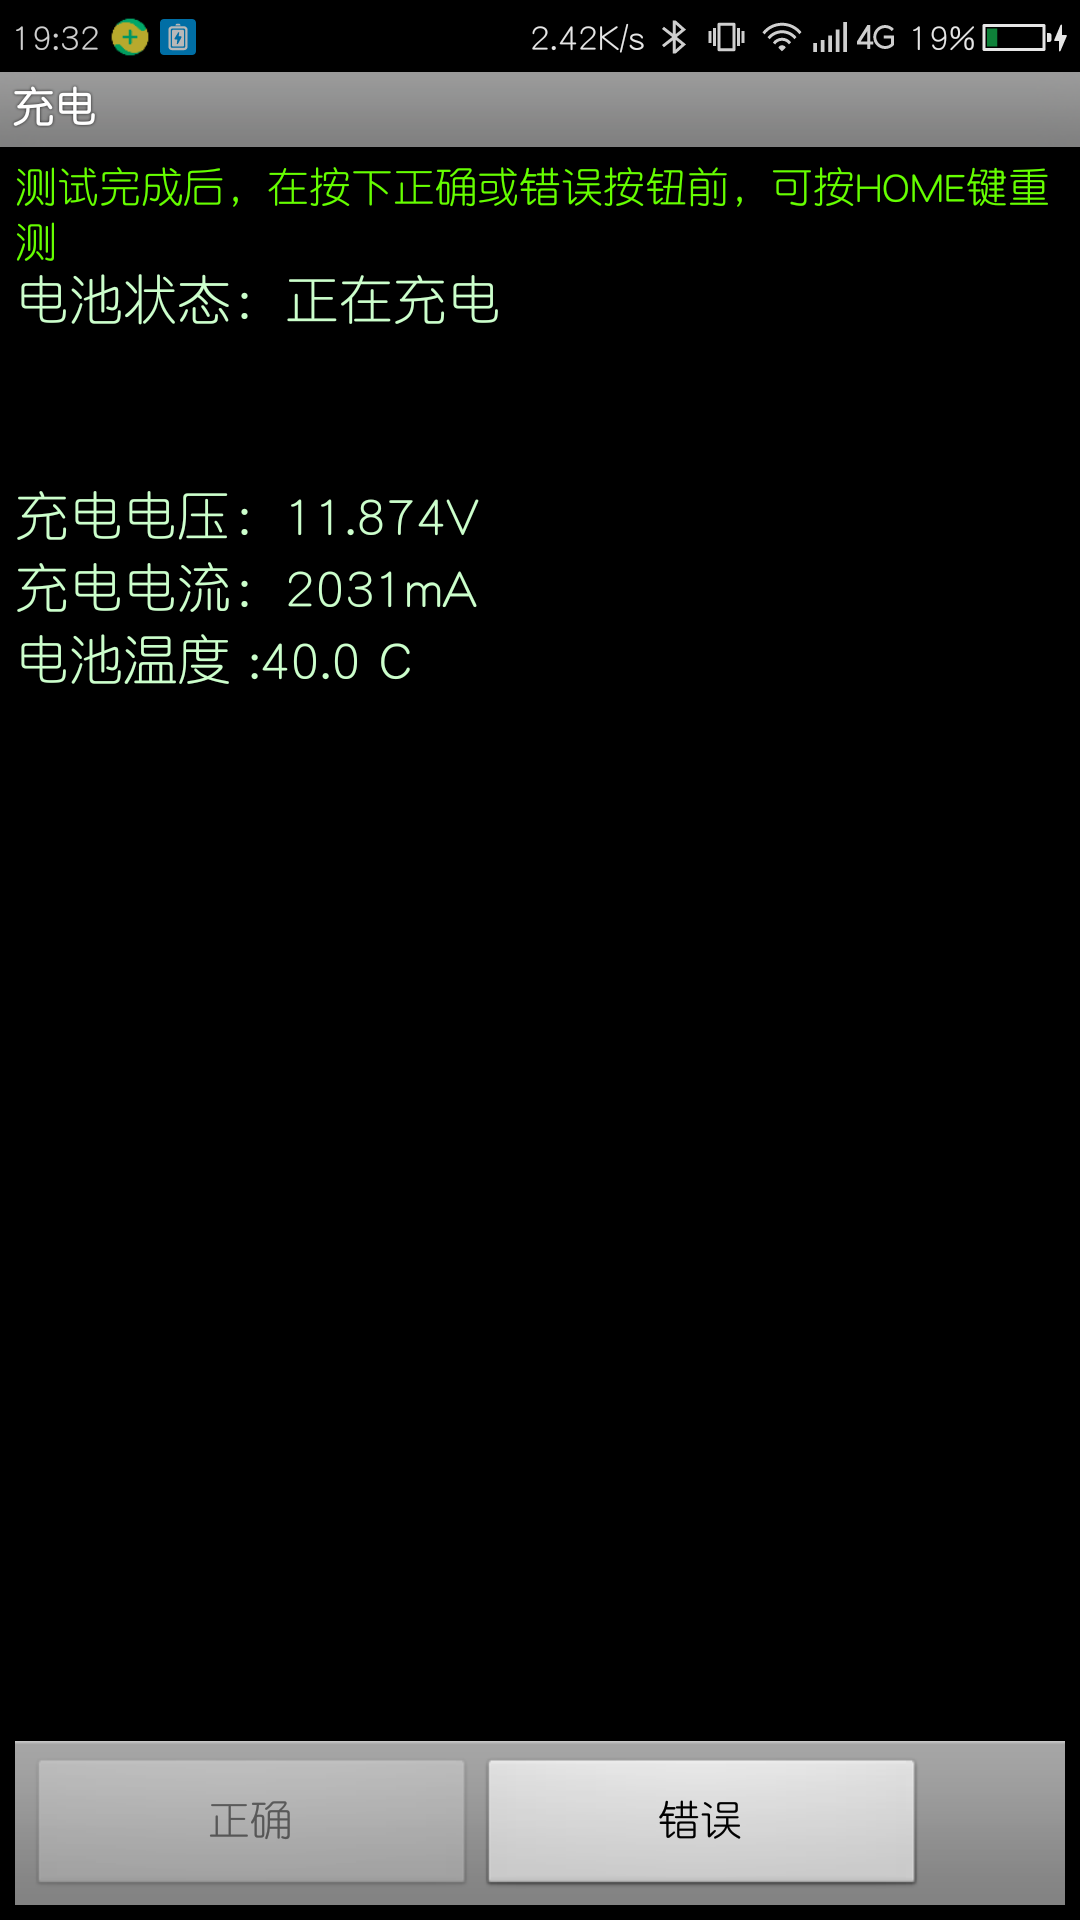 Screenshot_2017-07-17-19-32-57.png